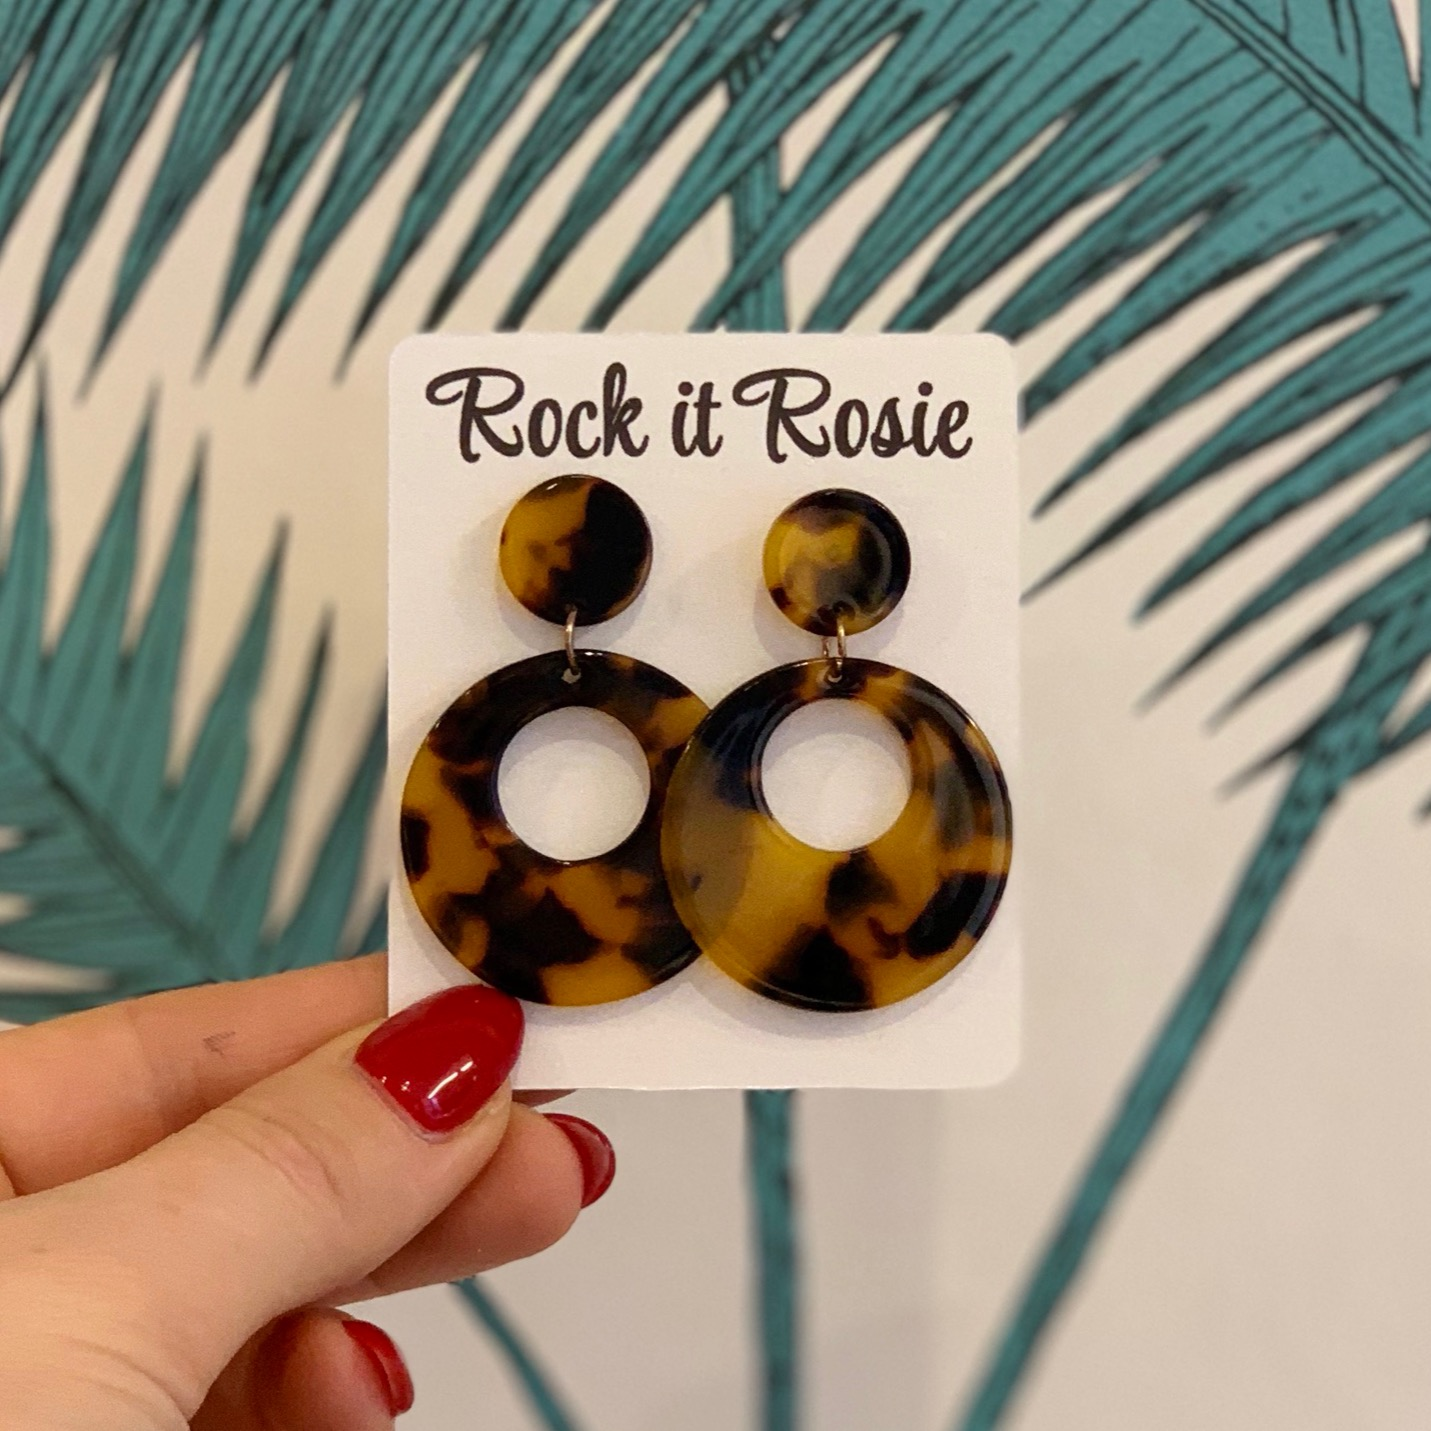 Retro hoops fra Rock It Rosie fås eksklusivt i butik Mondo Kaos på Nørrebro